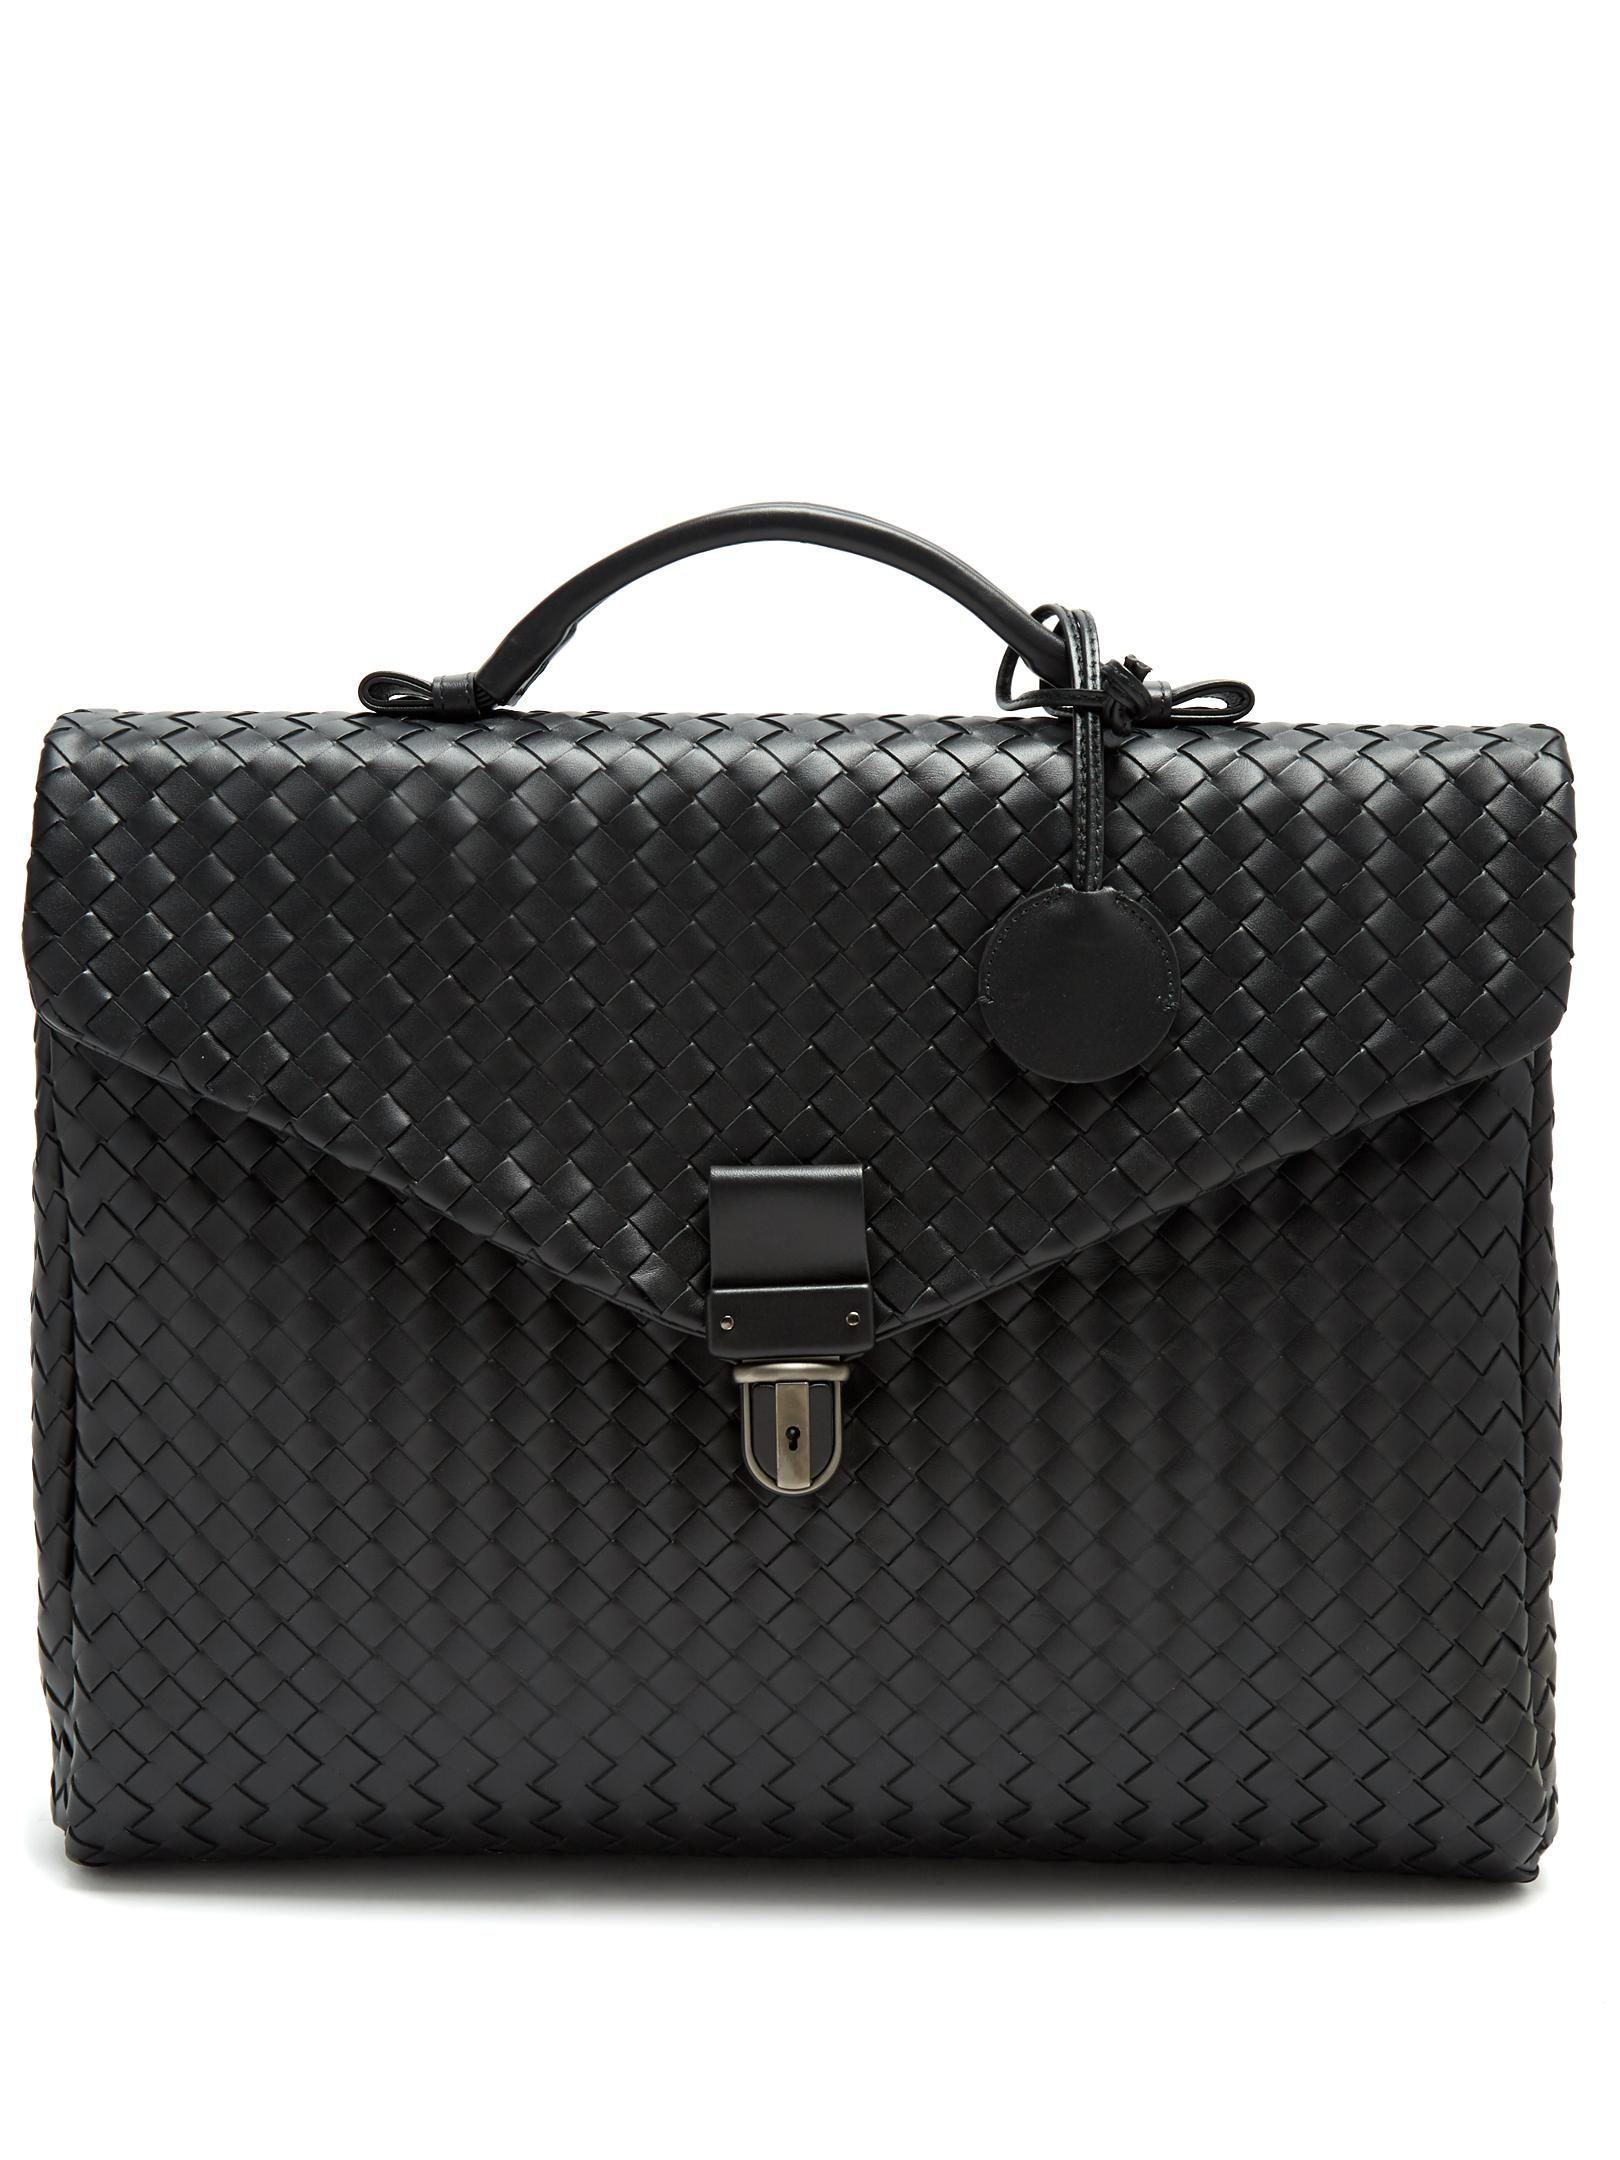 f7b8ab9745d5 Bottega Veneta Intrecciato Leather Briefcase in Black for Men - Lyst